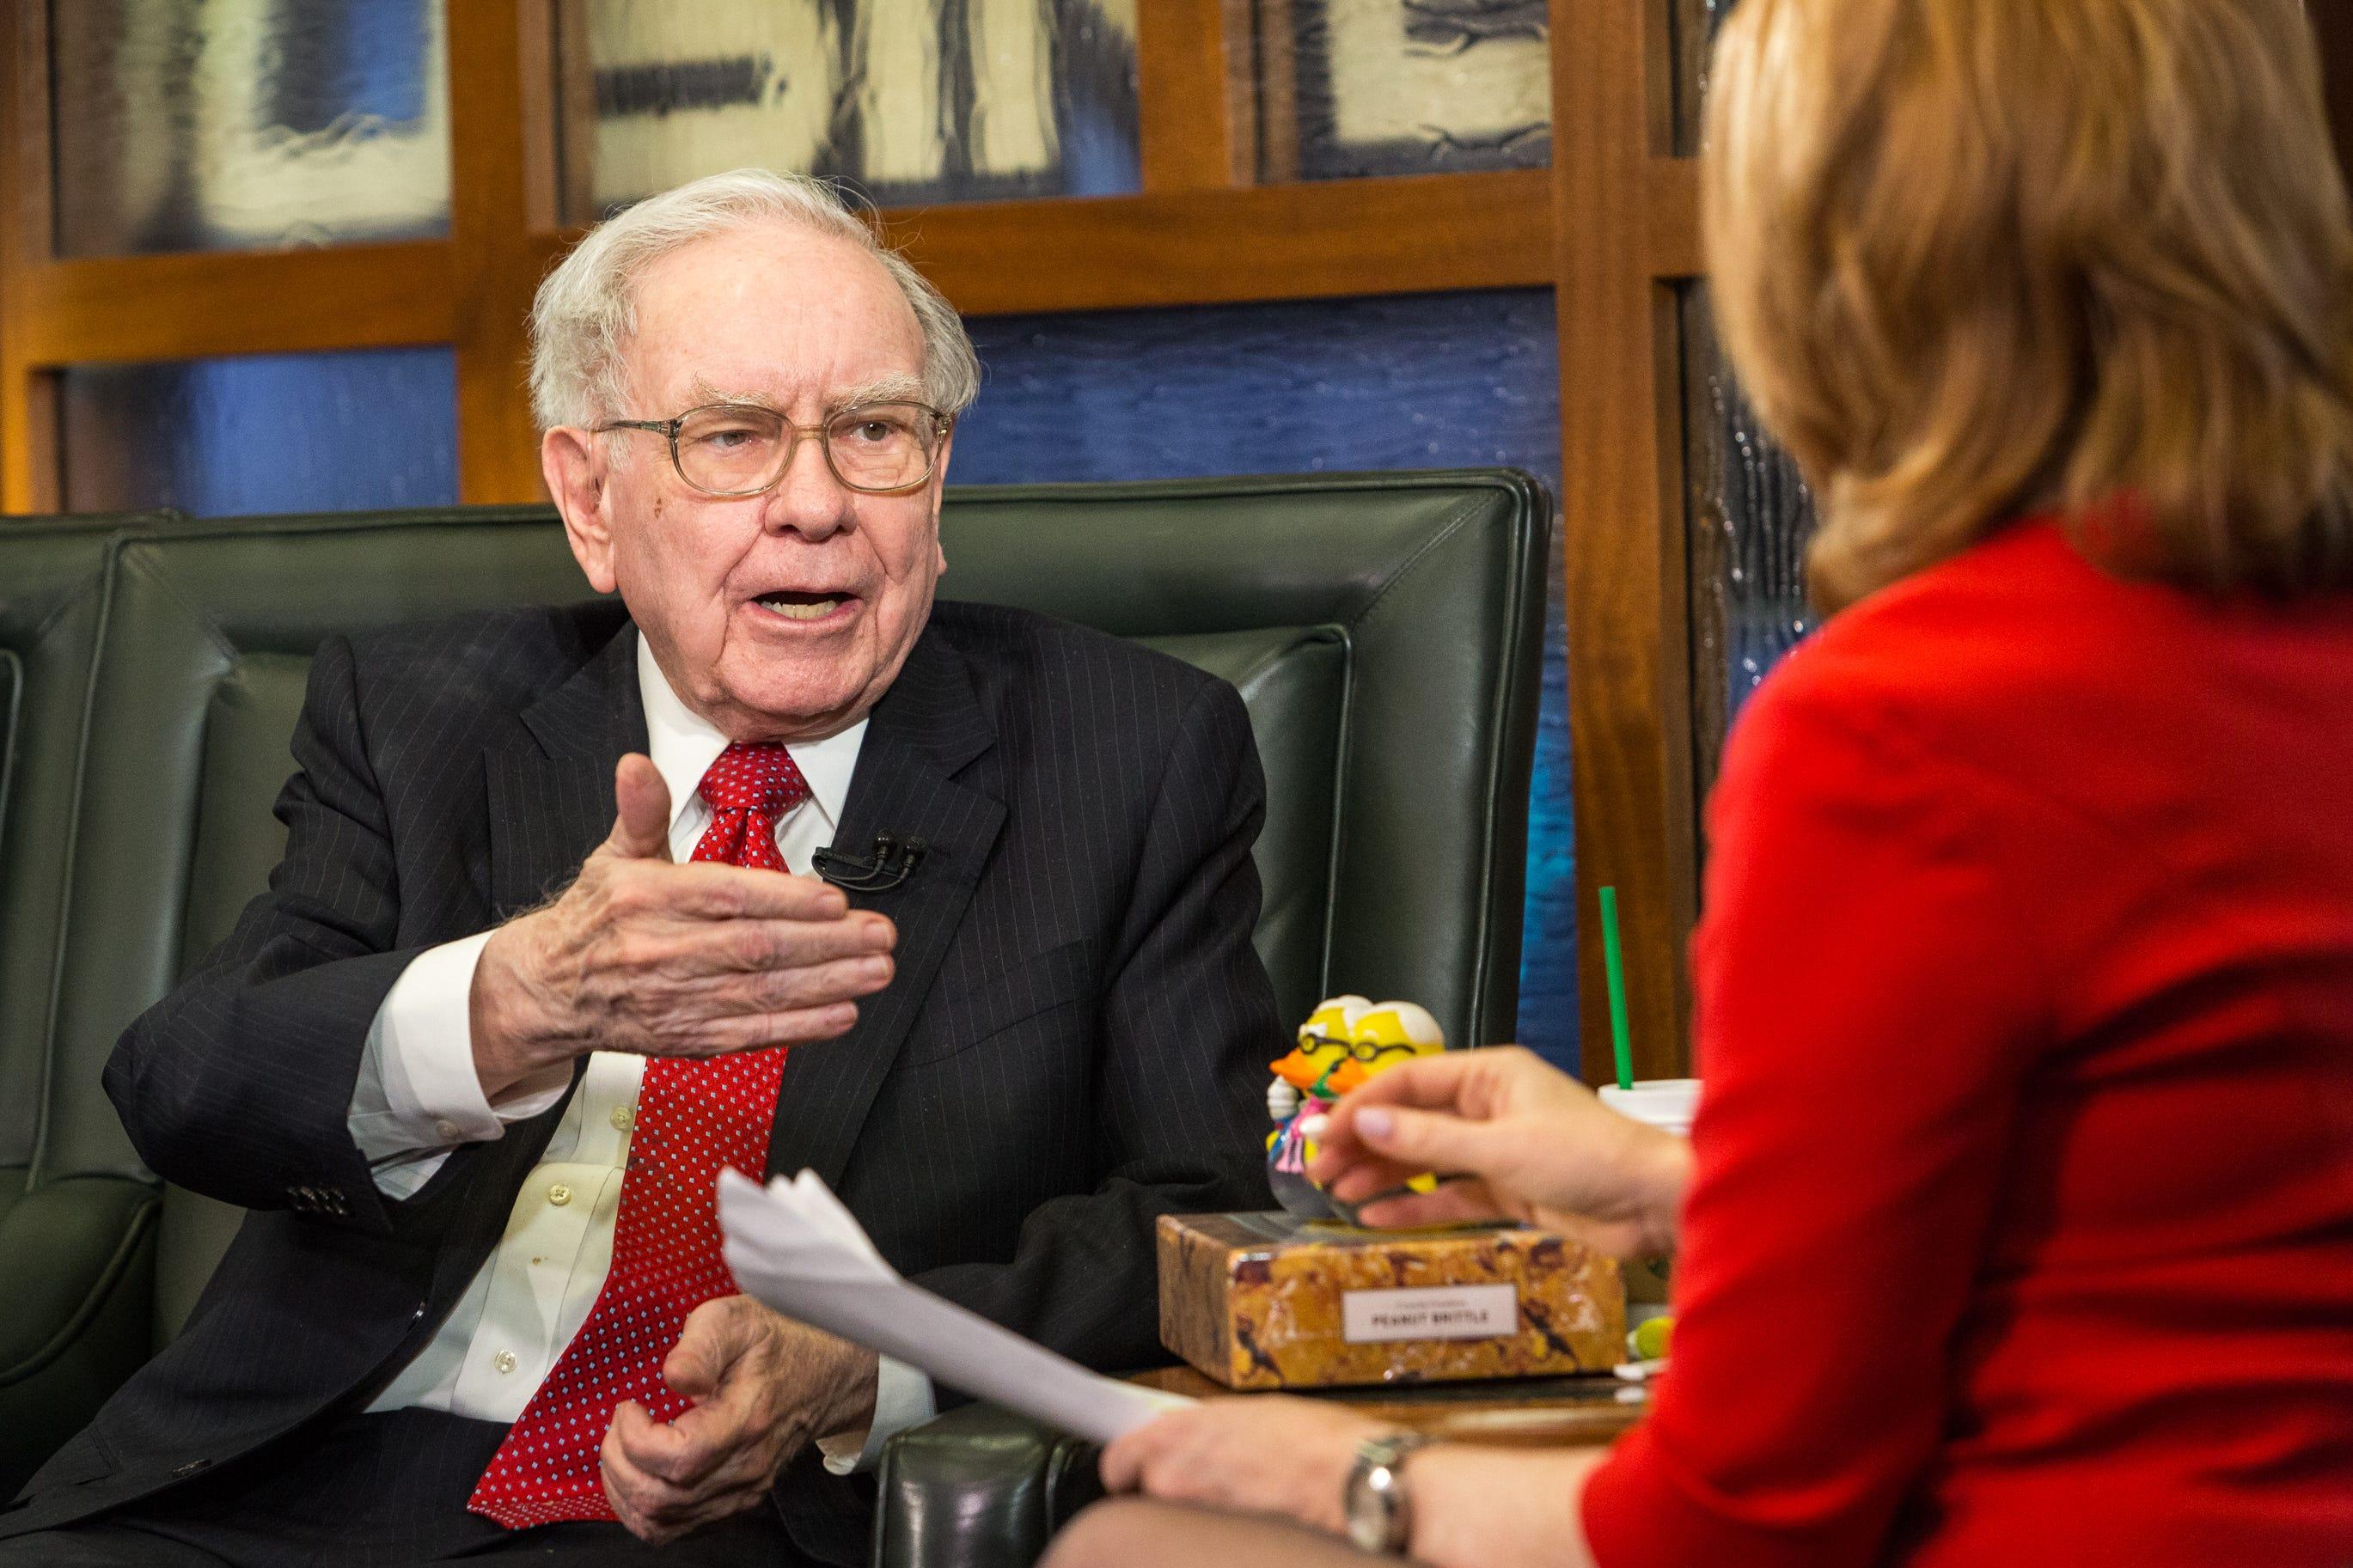 7 things Warren Buffett wants you to know